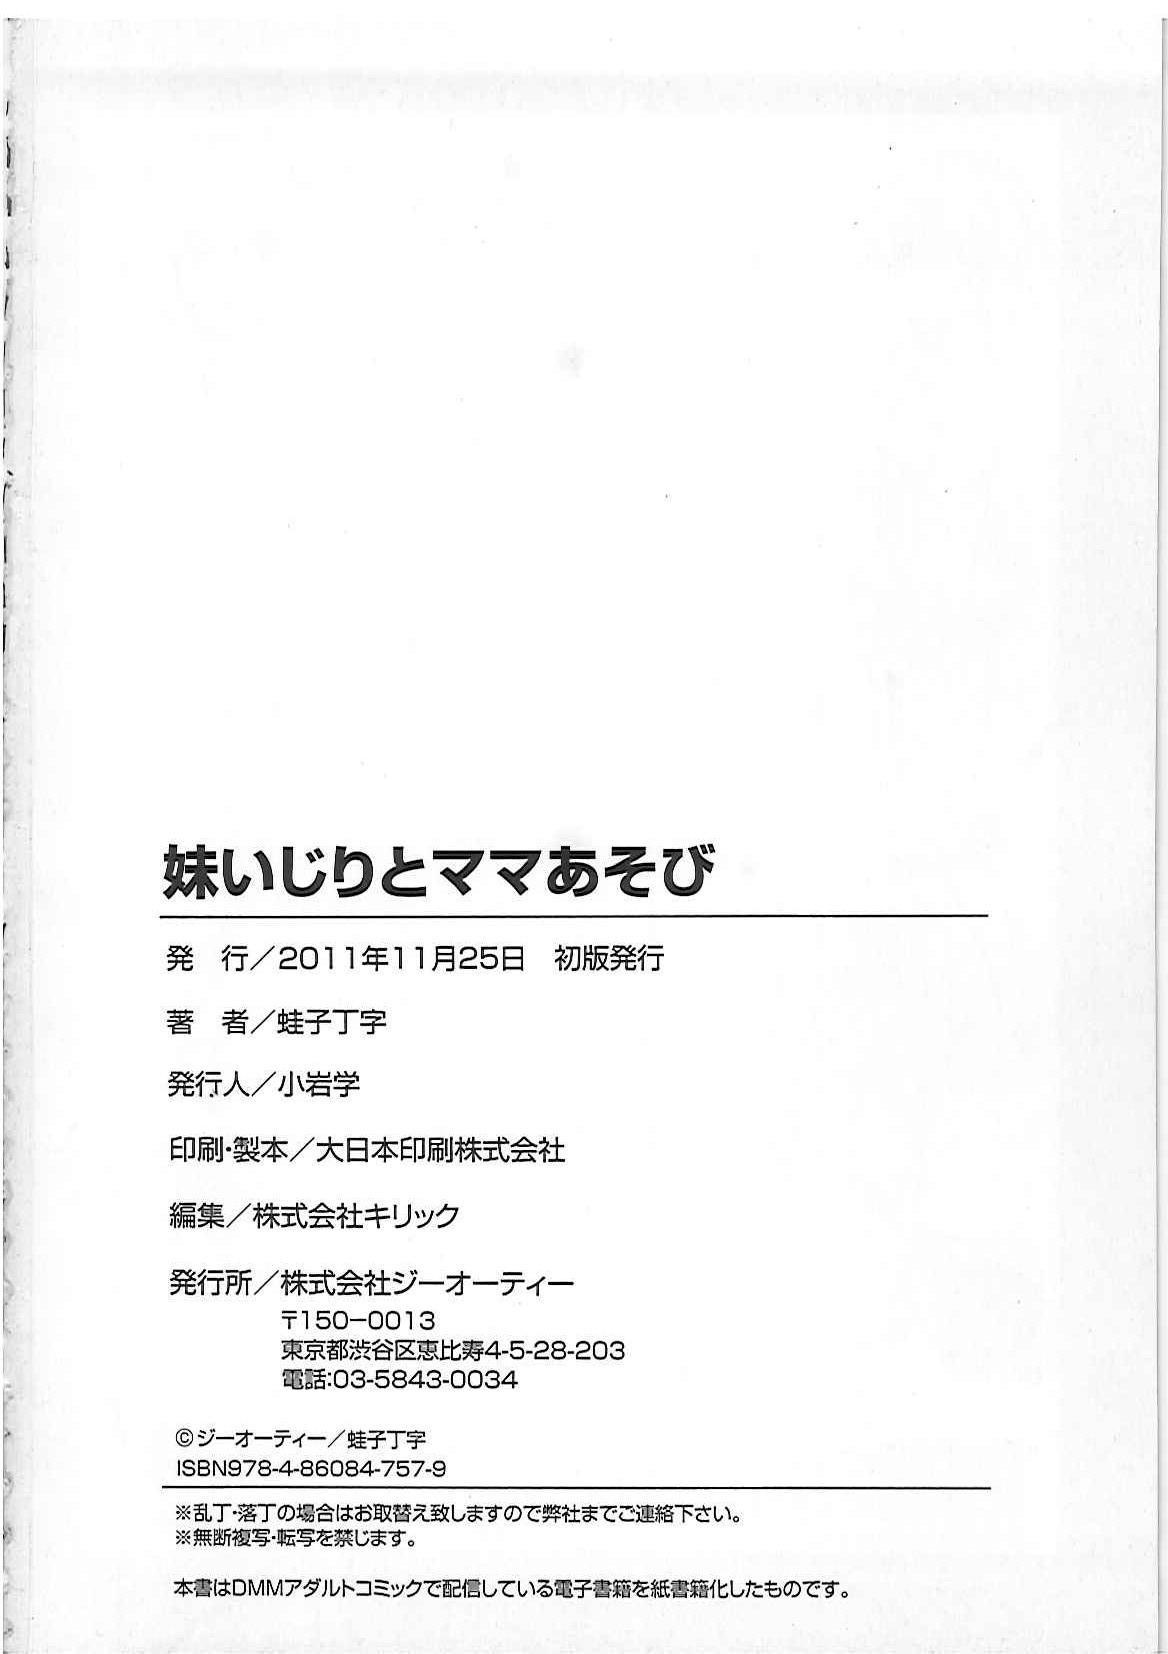 Imouto Ijiri to Mama Asobi 202